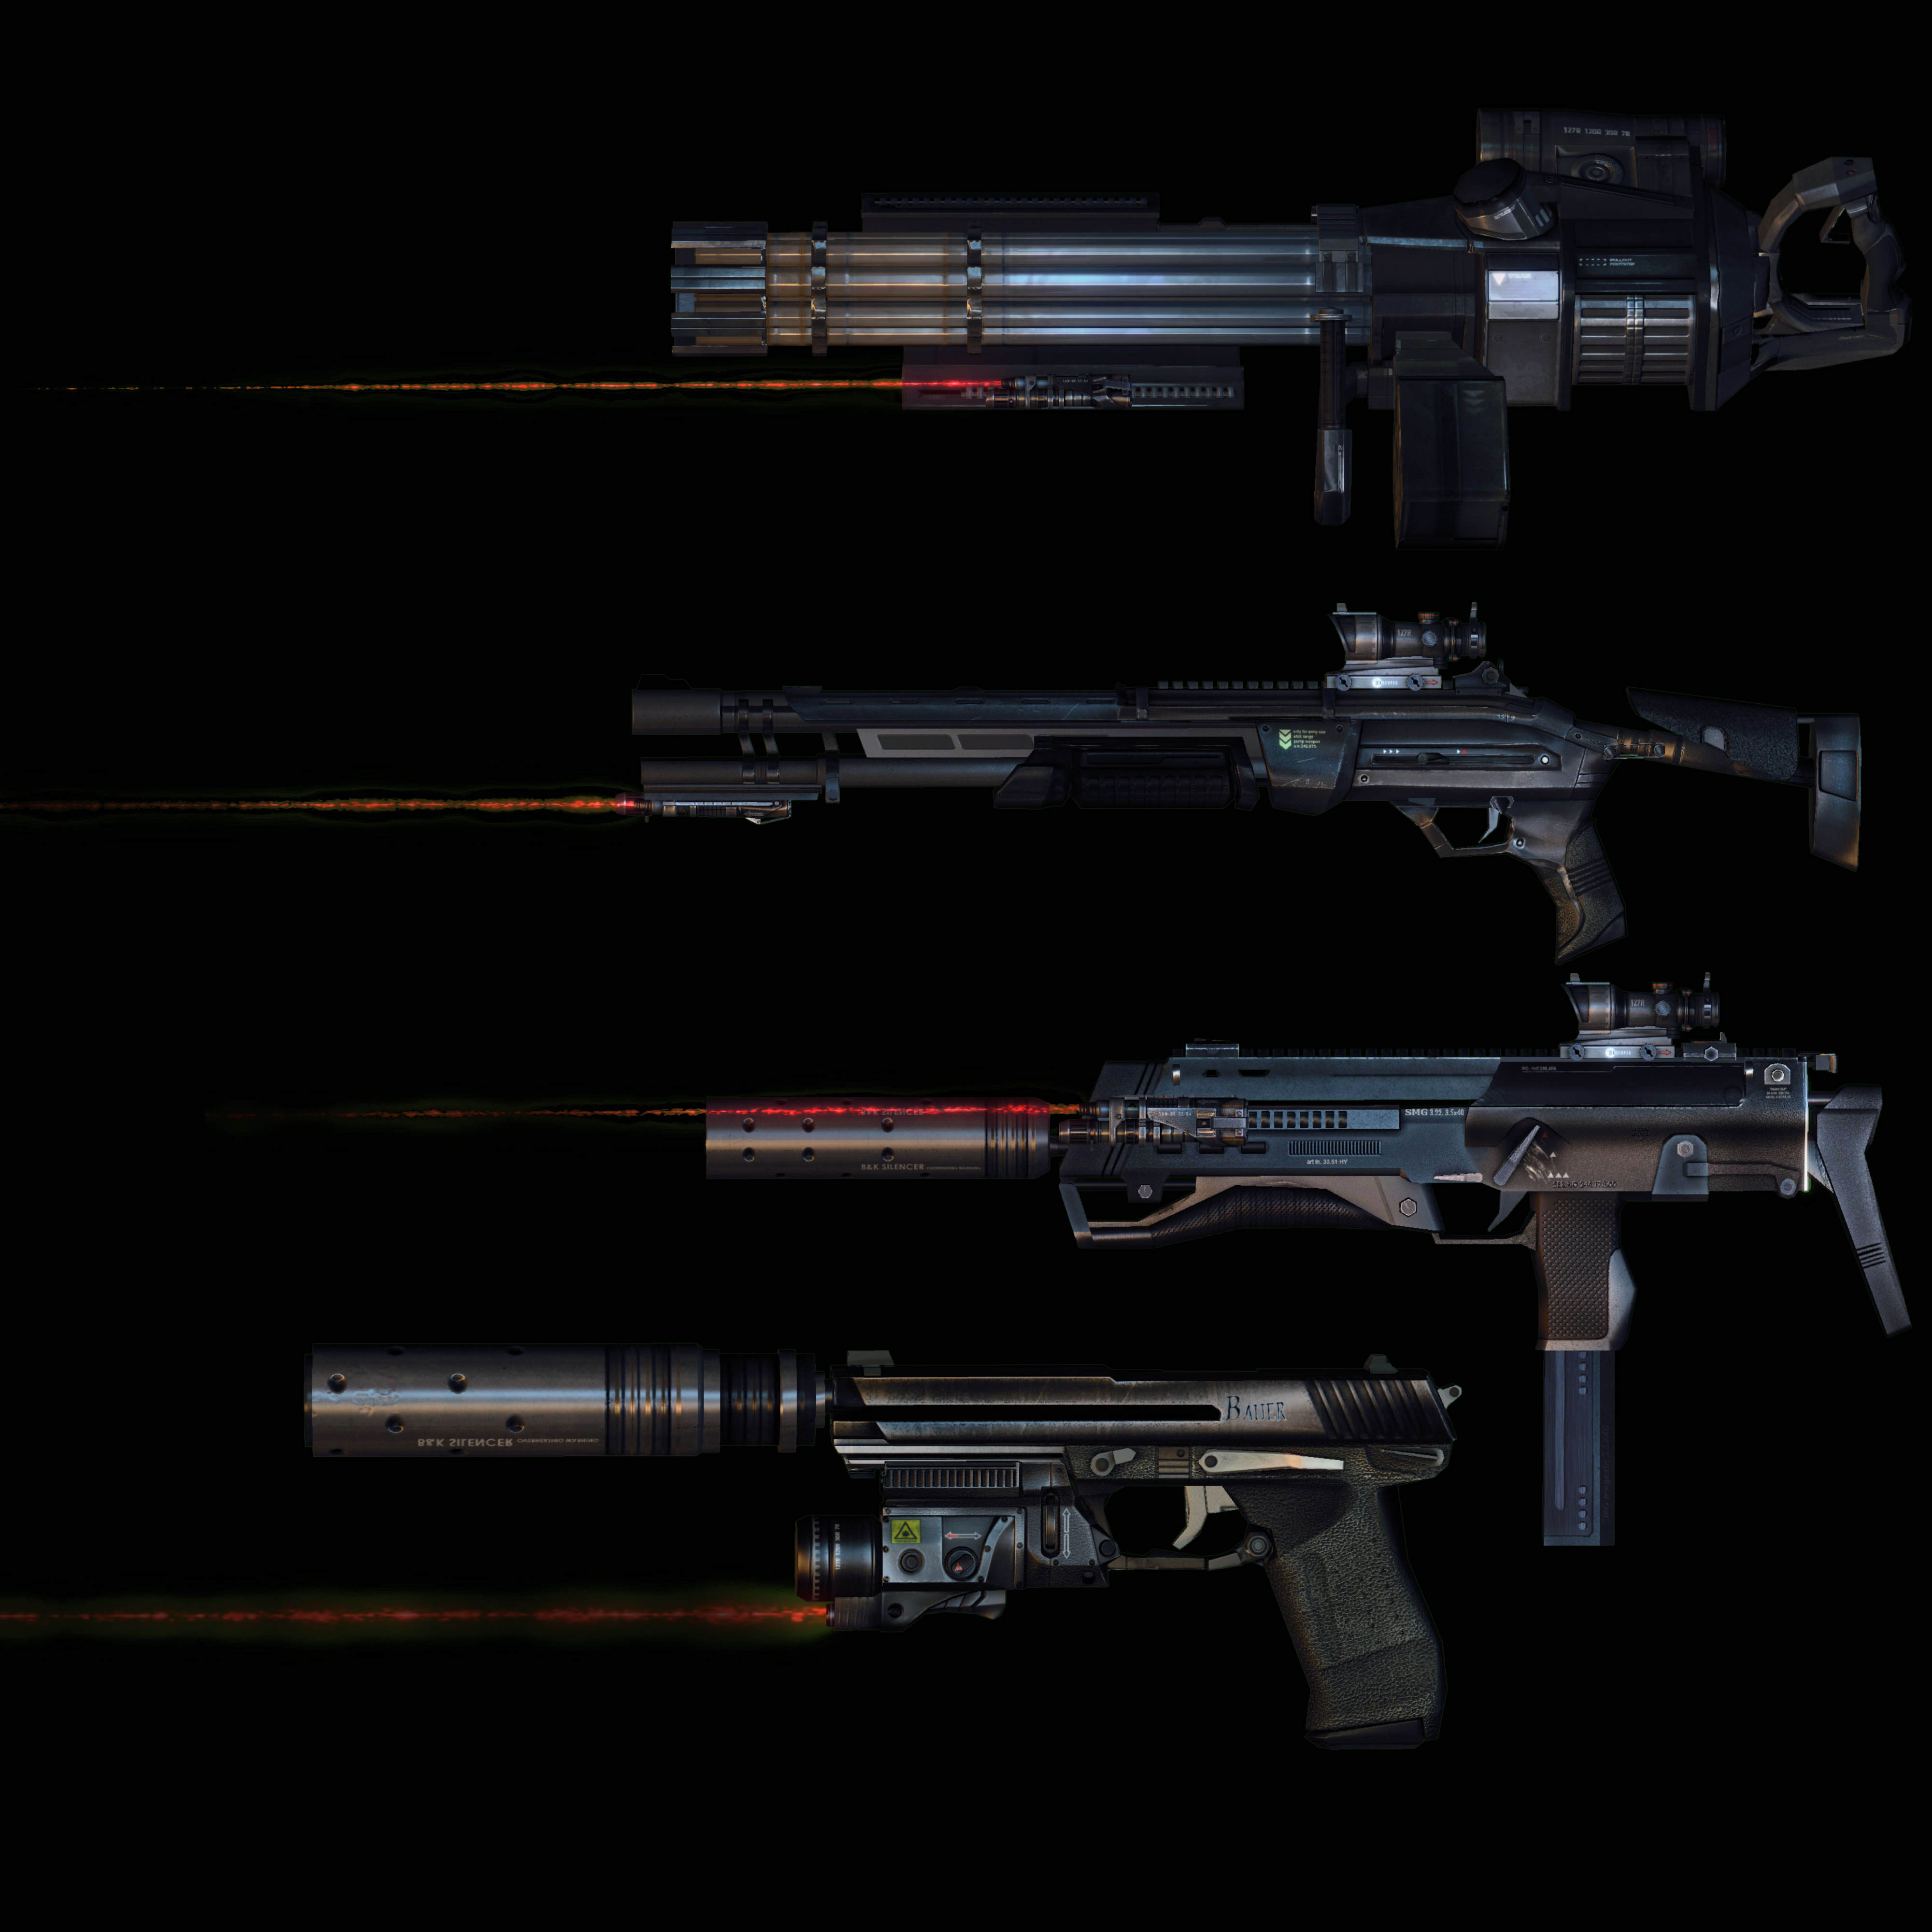 weapon-2.jpg